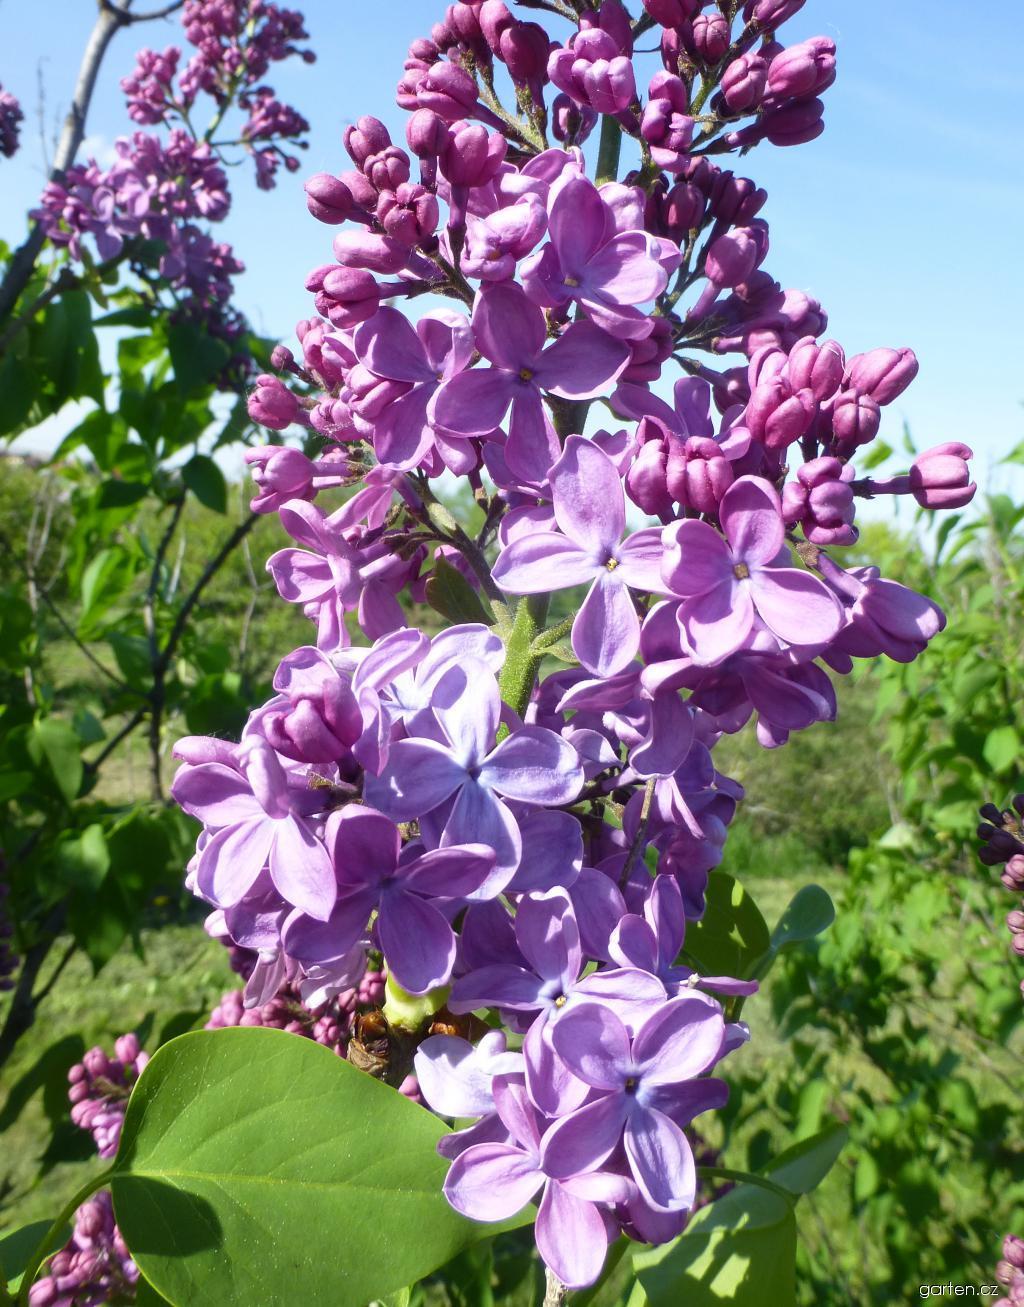 Šeřík hyacintokvětý Pink Spray (Syringa x hyacinthiflora)